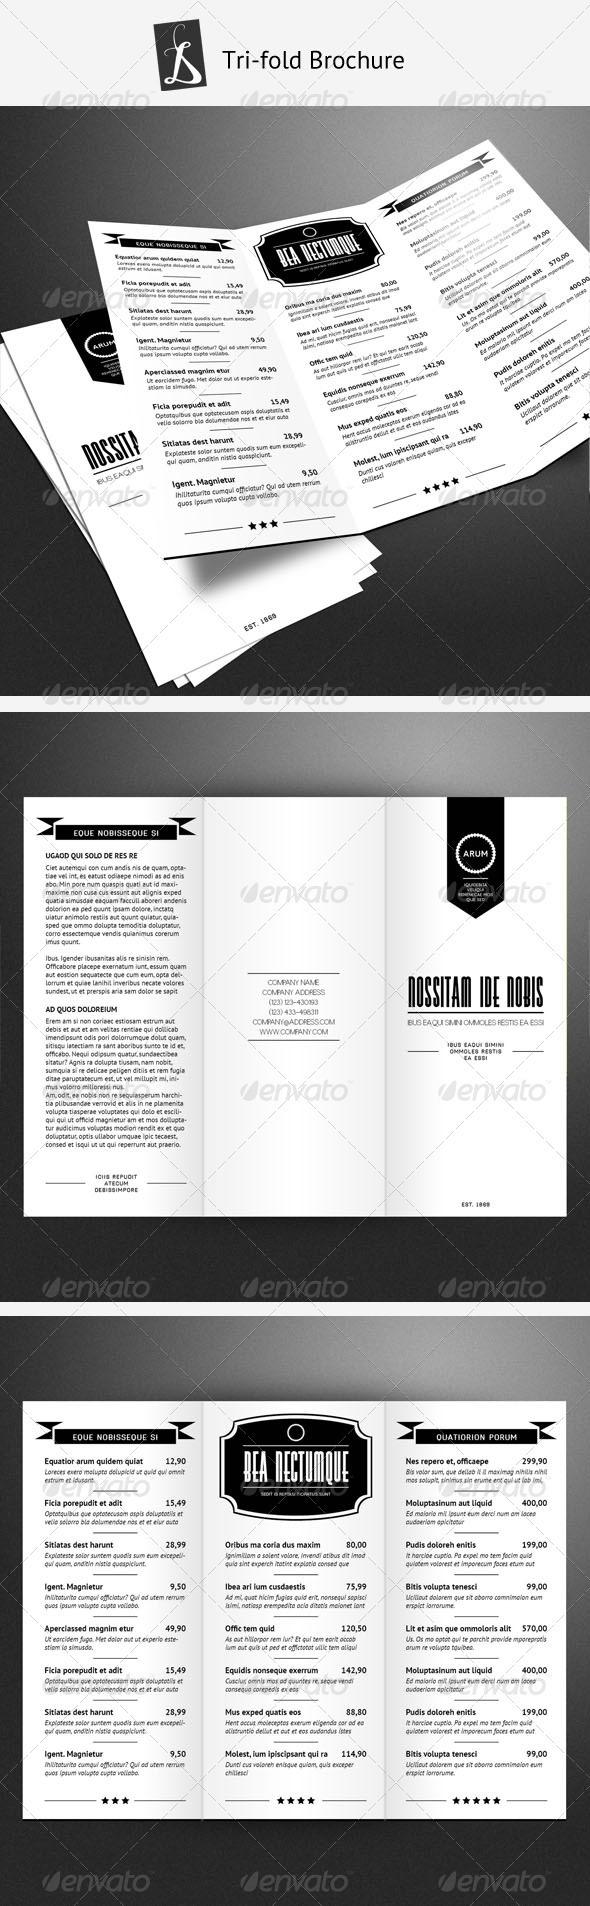 Tri-fold Brochure 2 - Food Menus Print Templates